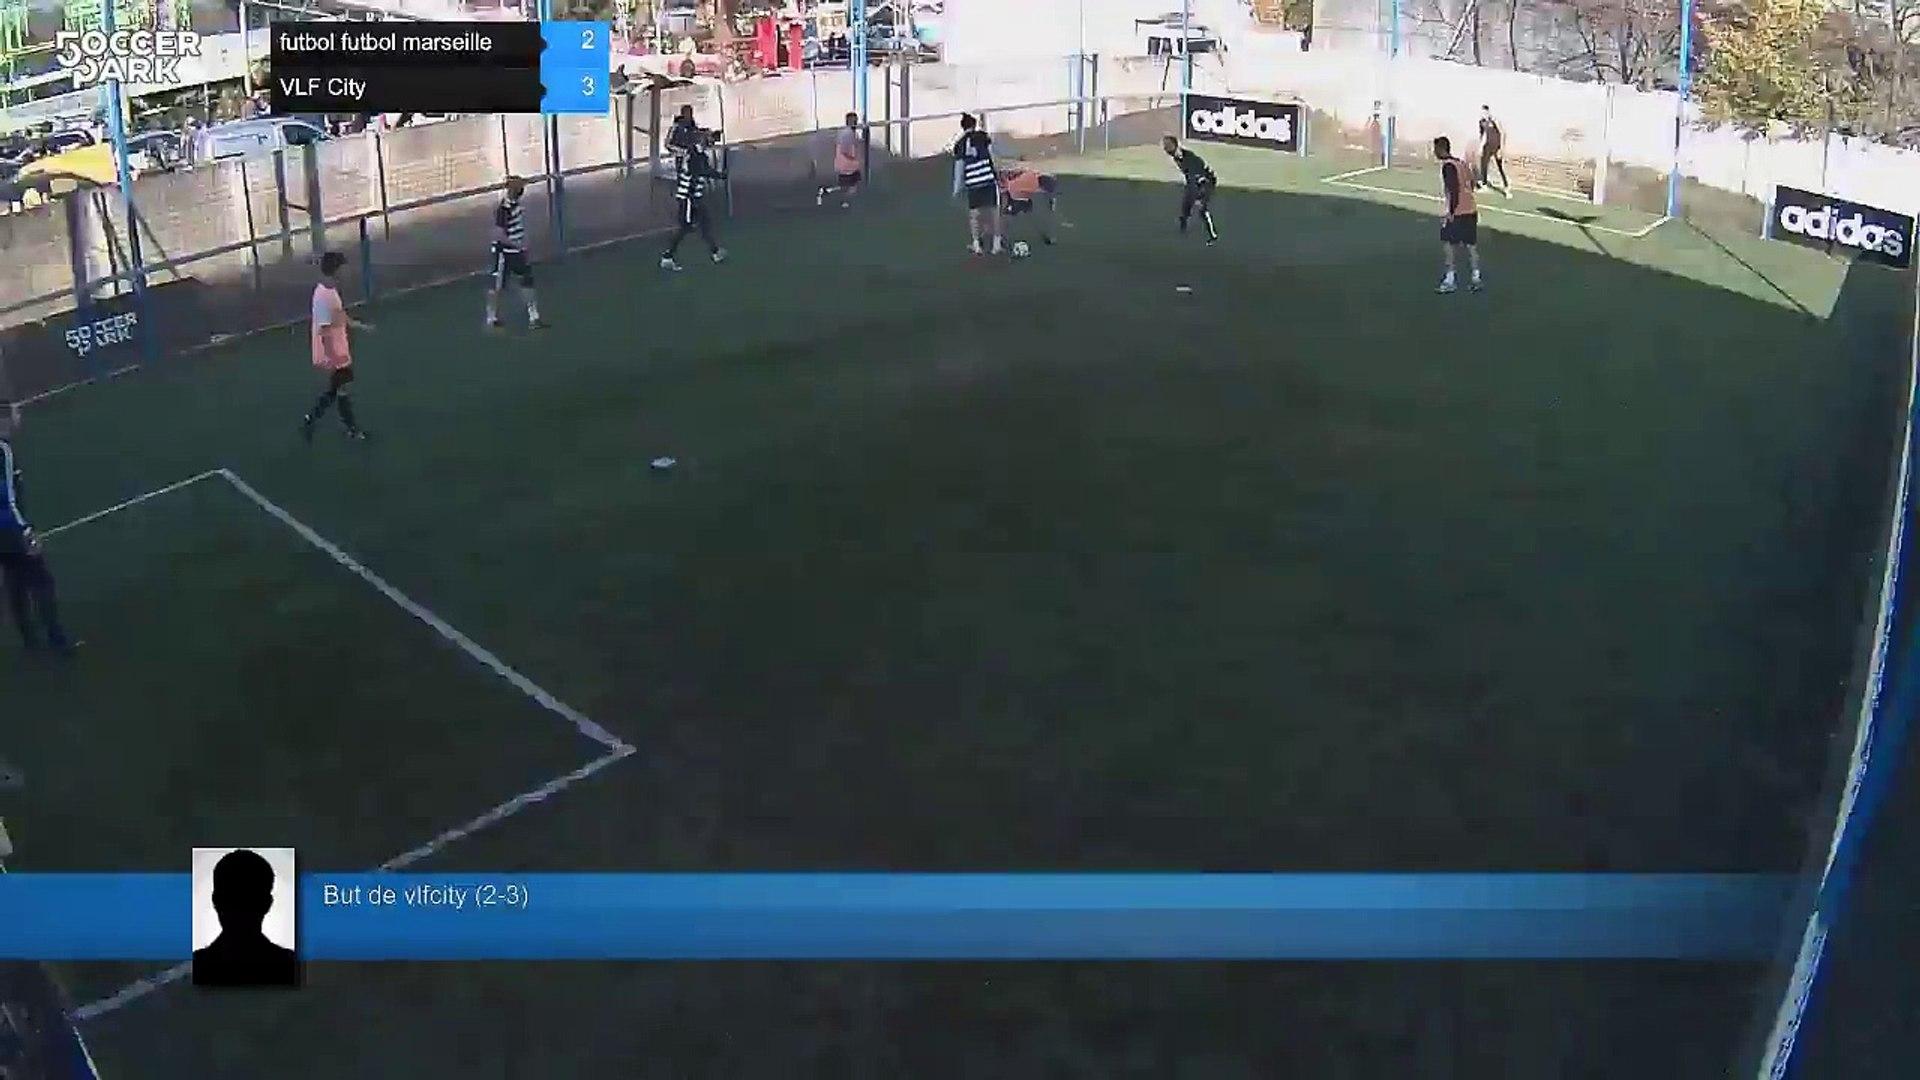 But de vlfcity (2-3) - futbol futbol marseille Vs VLF City - 12/12/15 11:22 - F5WC Finale regionale